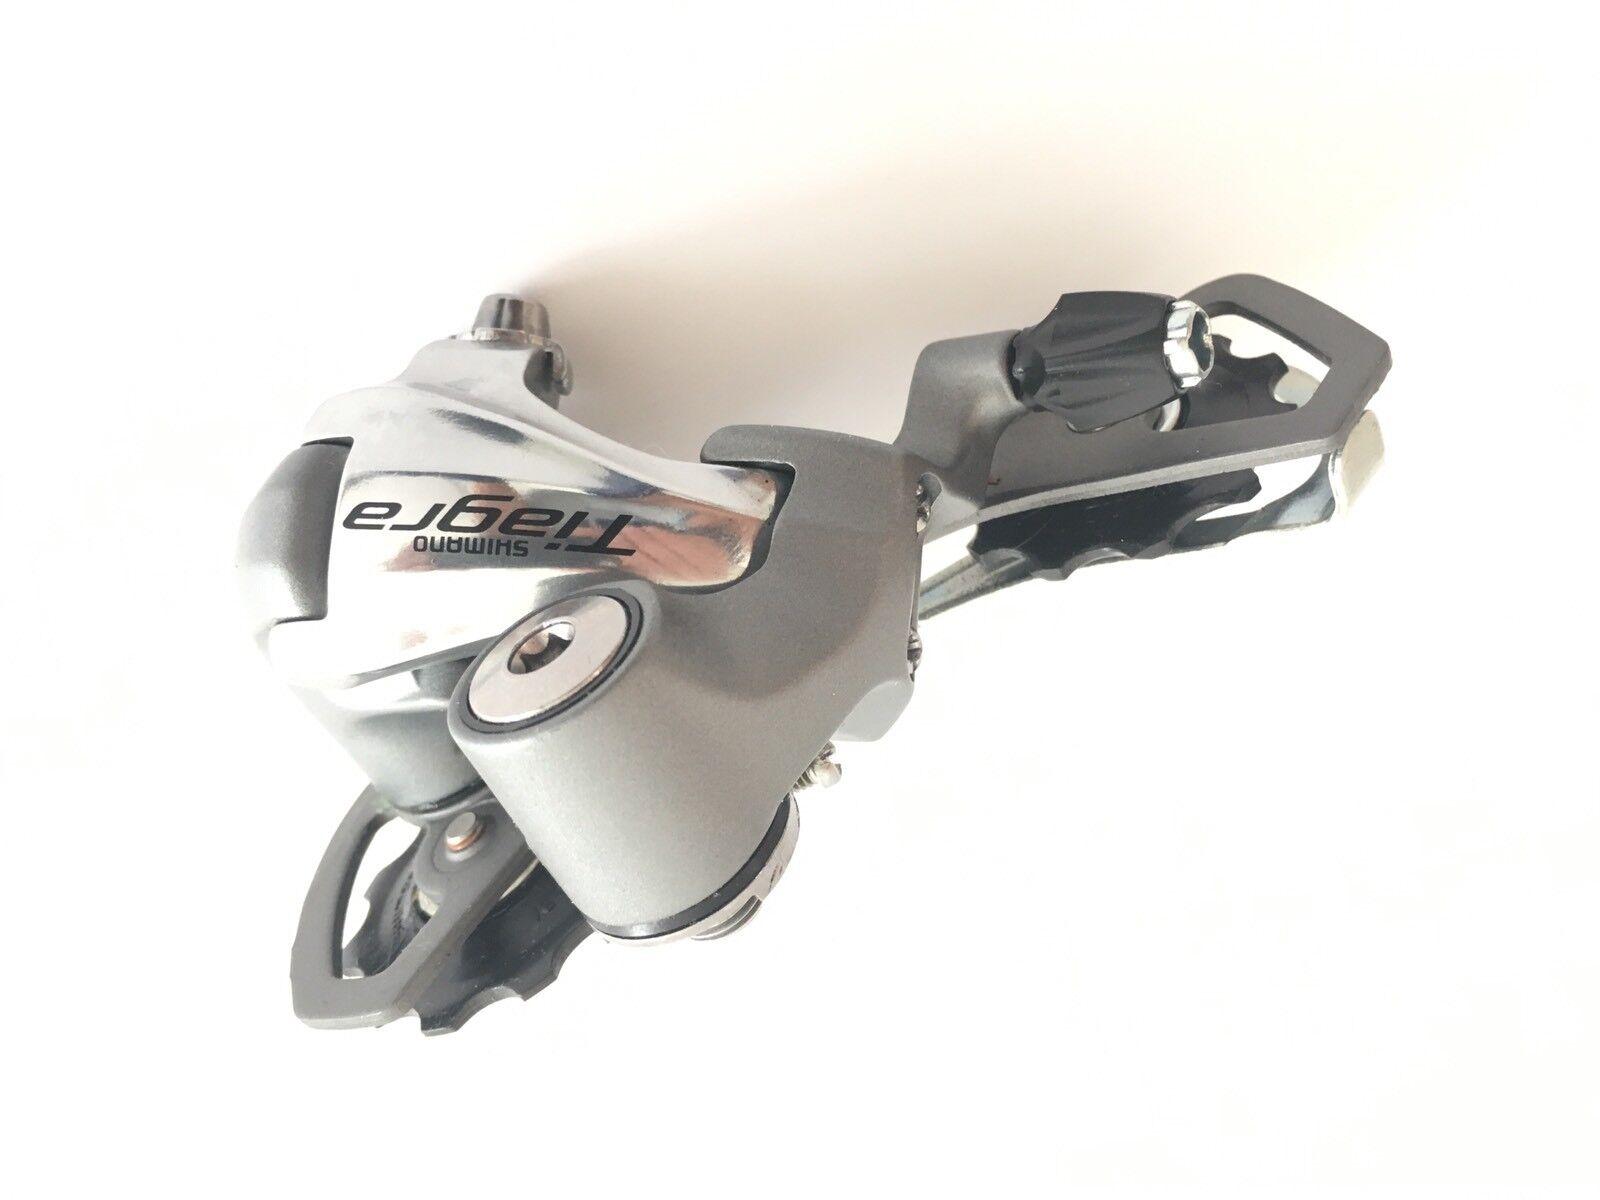 Shimano Tiagra Schaltwerk RD-4601 + Umwerfer FD-4700 2x10 fach Schelle Ø 34,9 mm